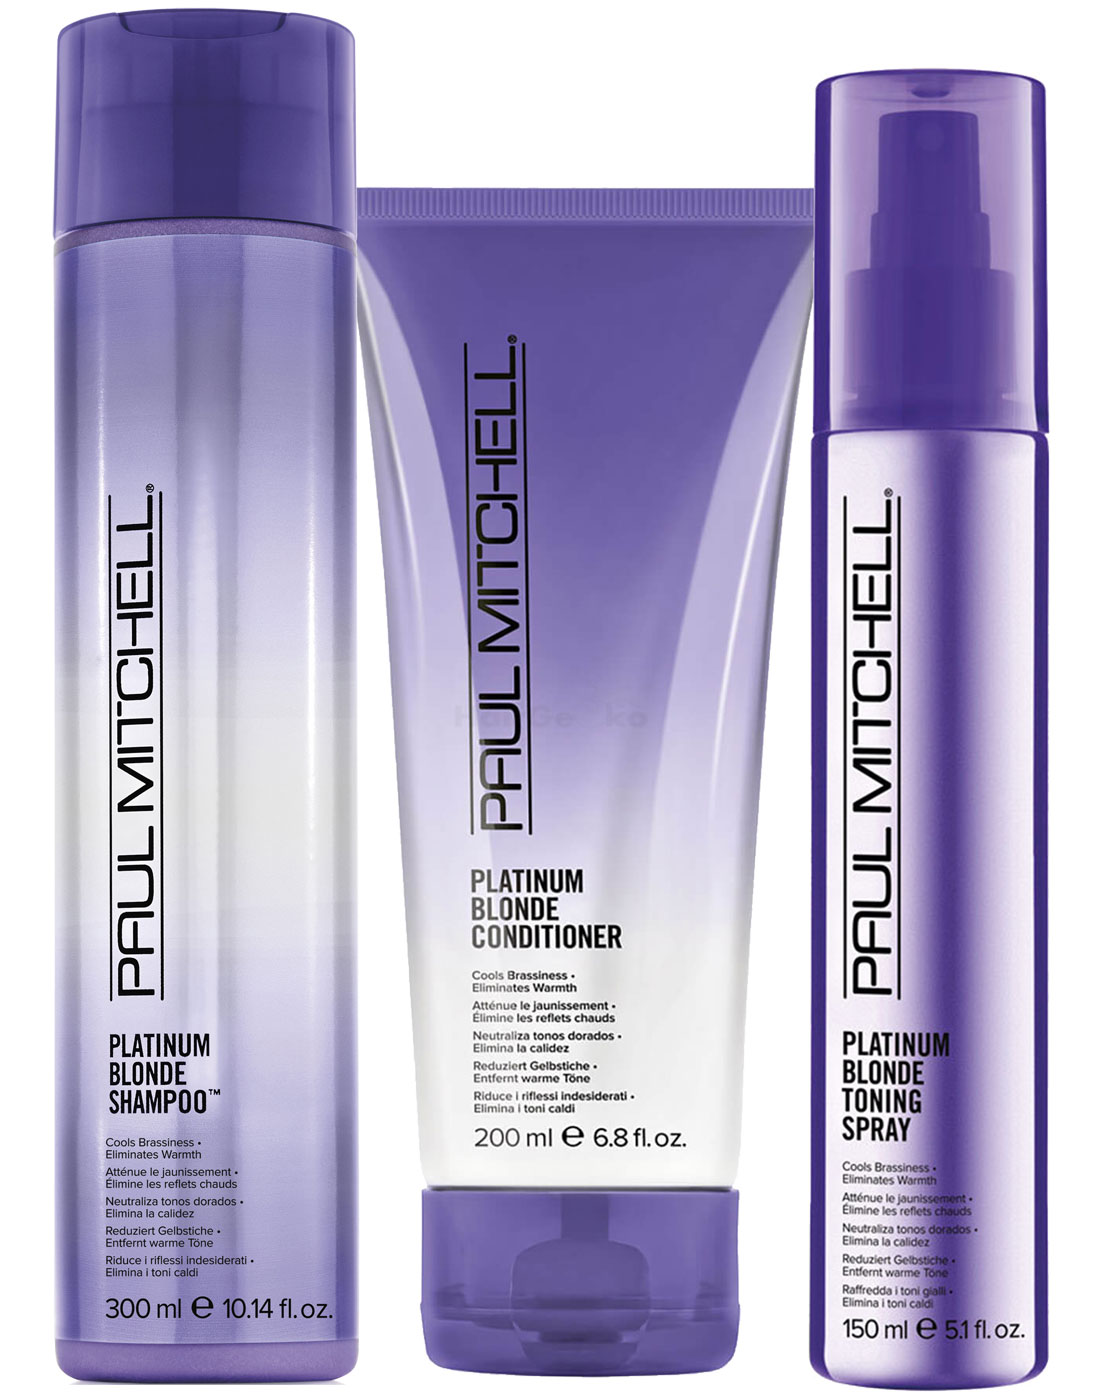 Paul Mitchell Platinum Blonde Set - Shampoo 300ml + Conditioner 200ml + Toning Spray 150ml